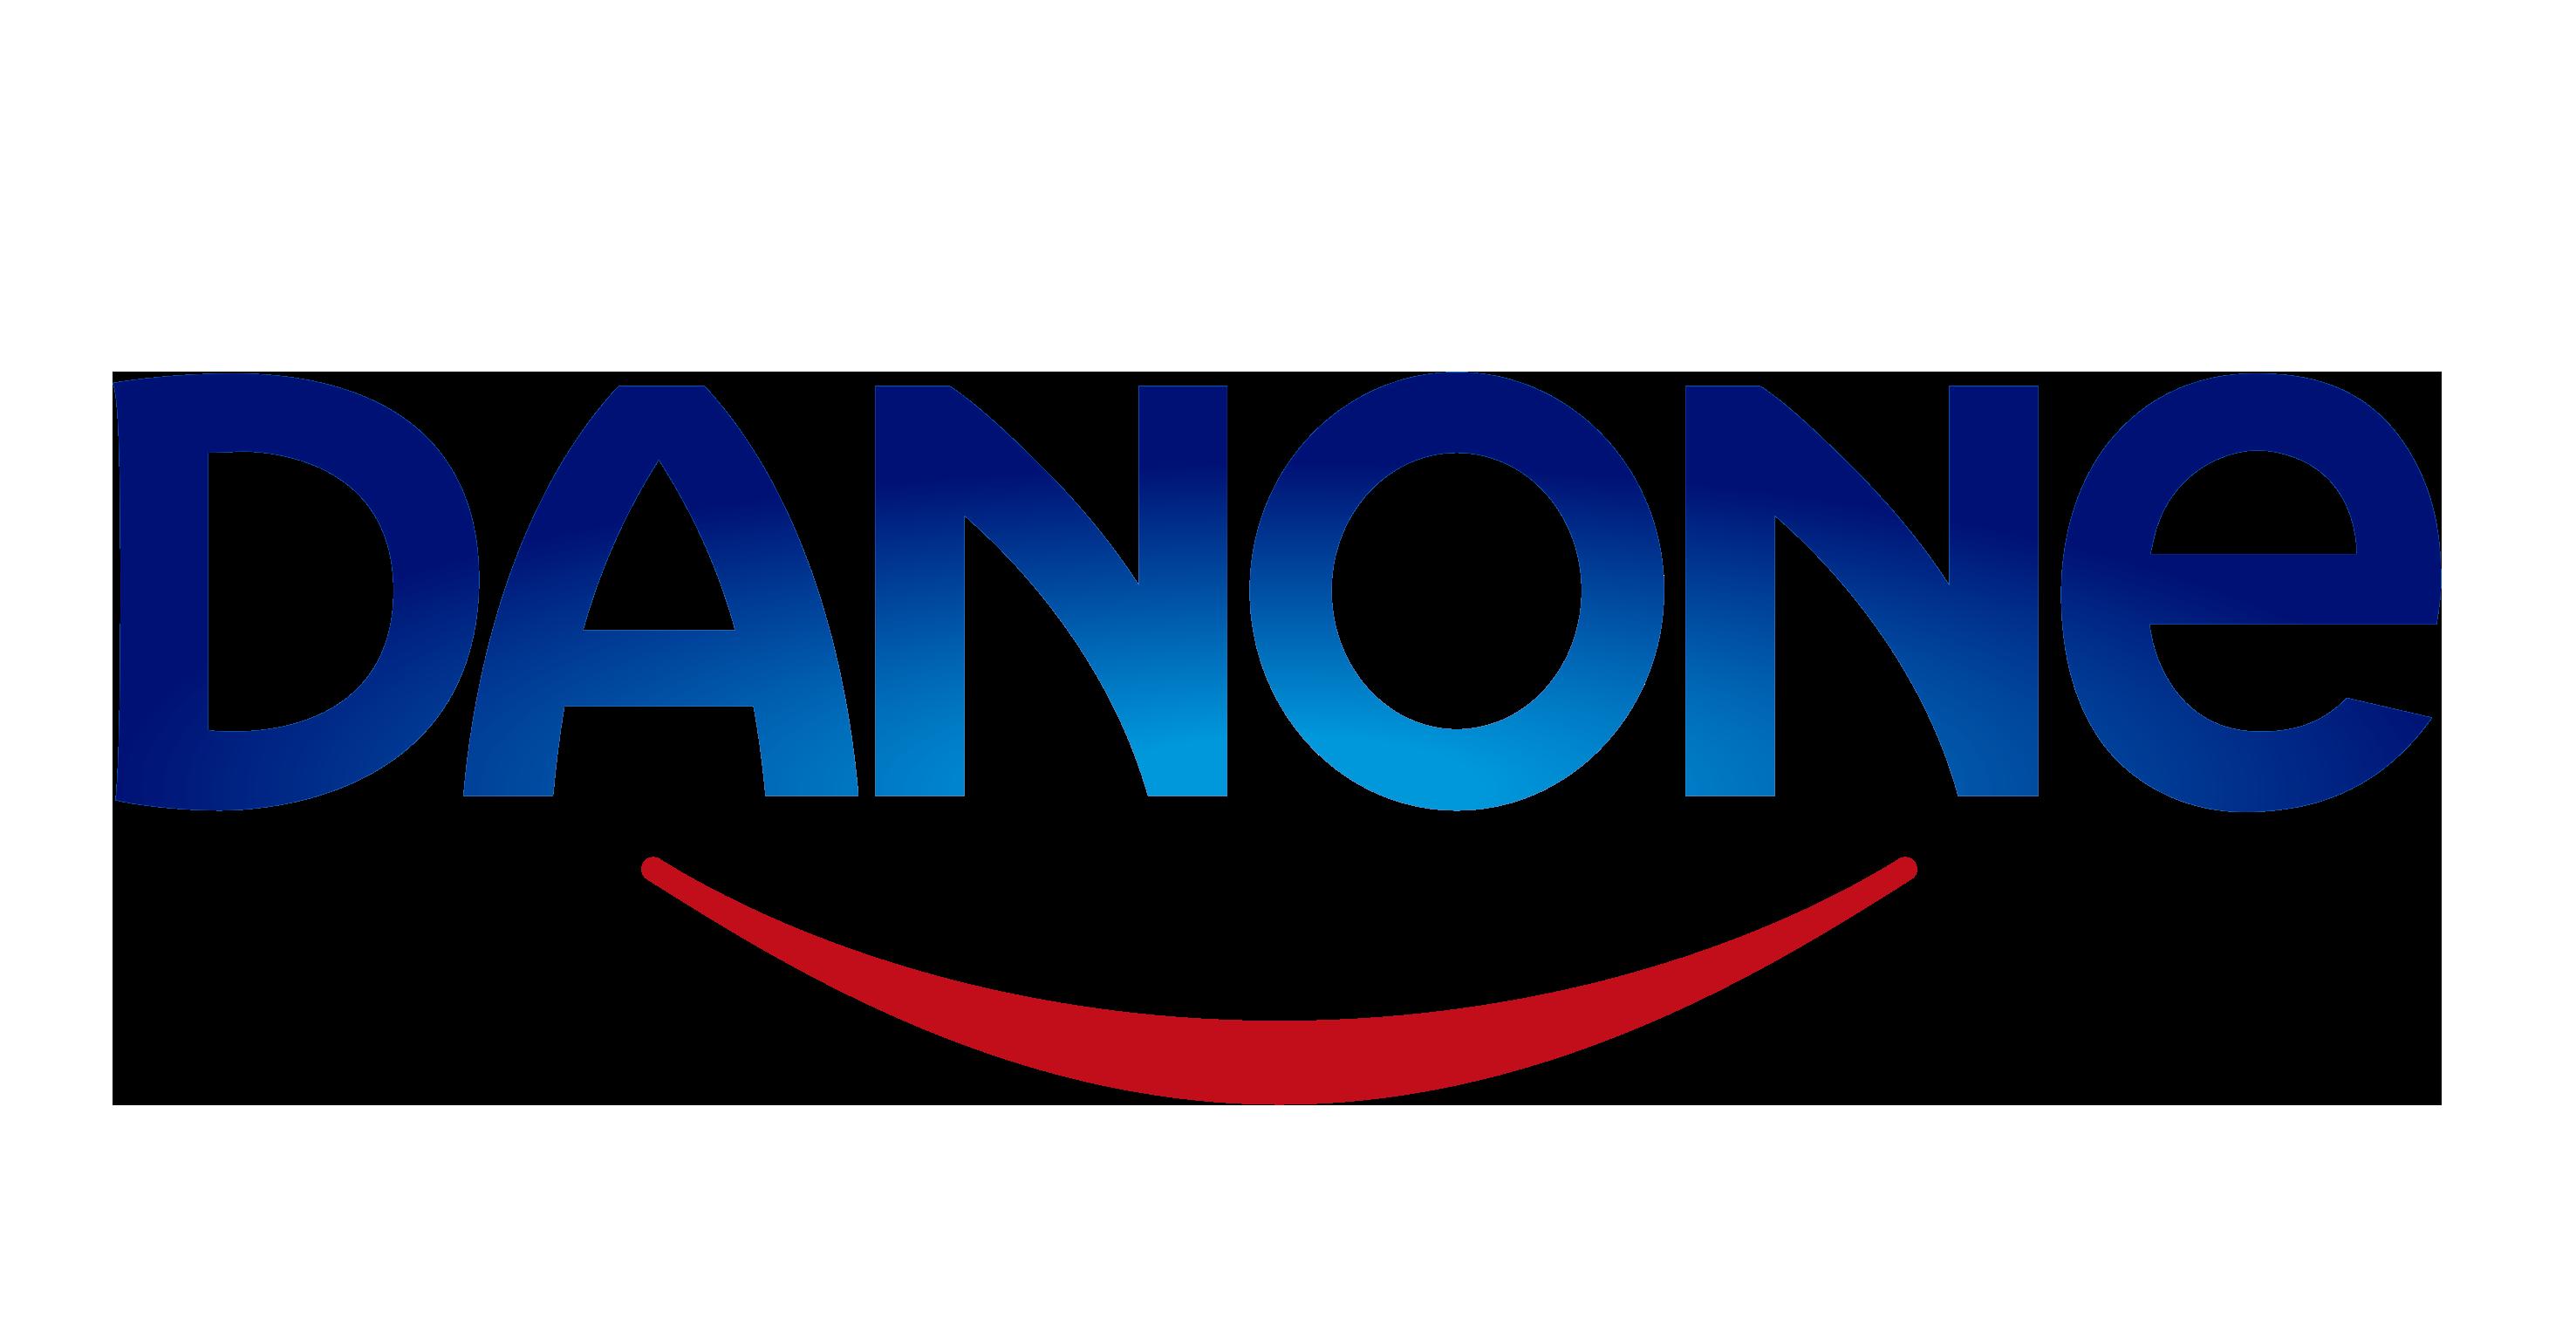 Image of Danone logo.